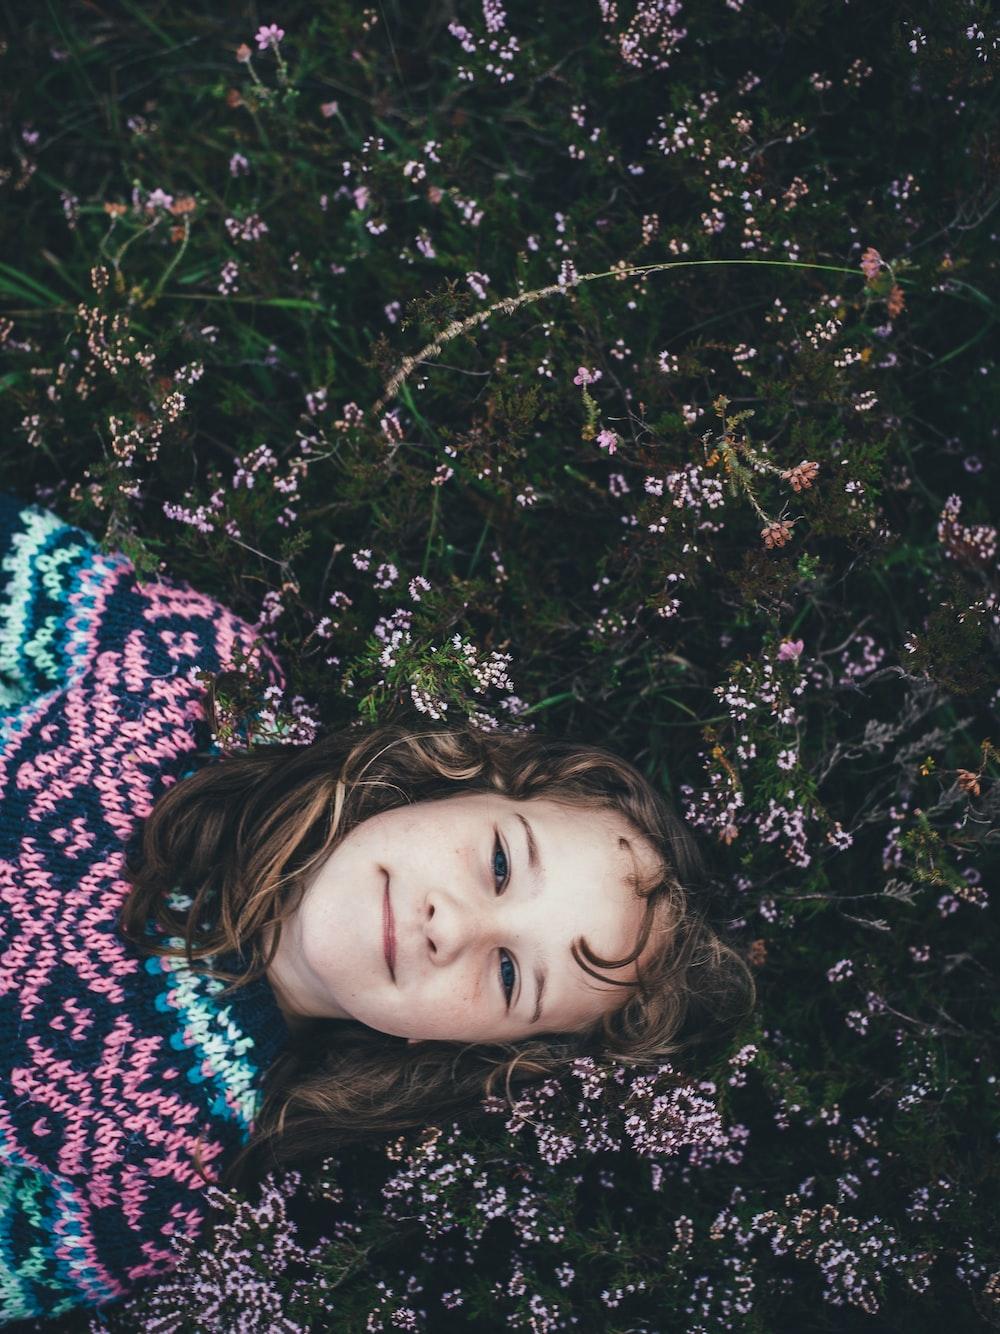 girl lying on pink petaled flowers